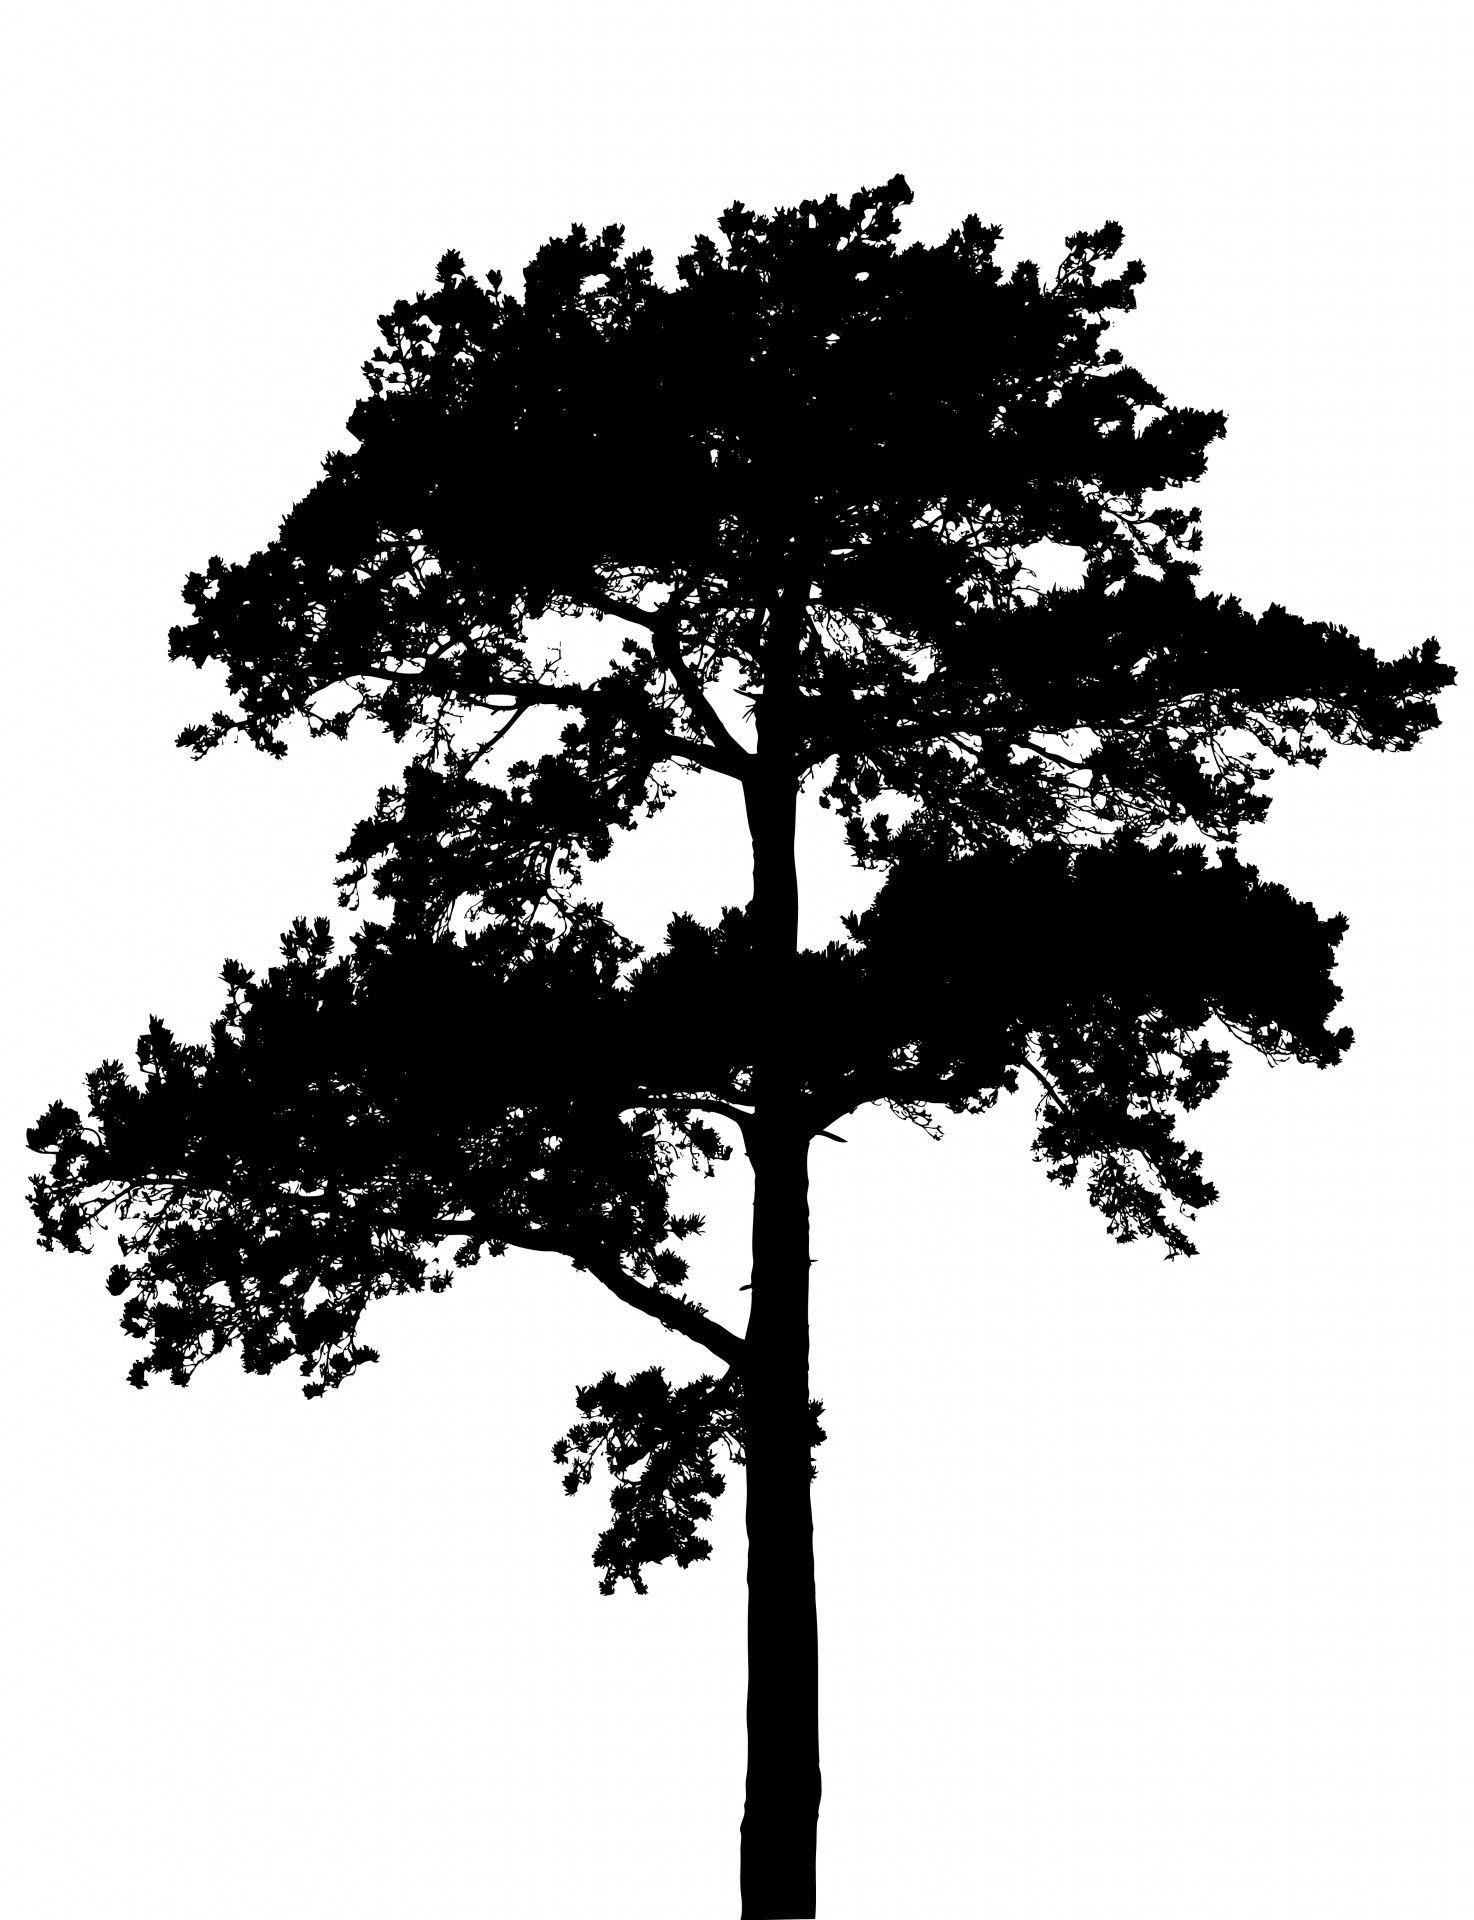 Image Result For Tree Silhouette Pine Tree Silhouette Tree